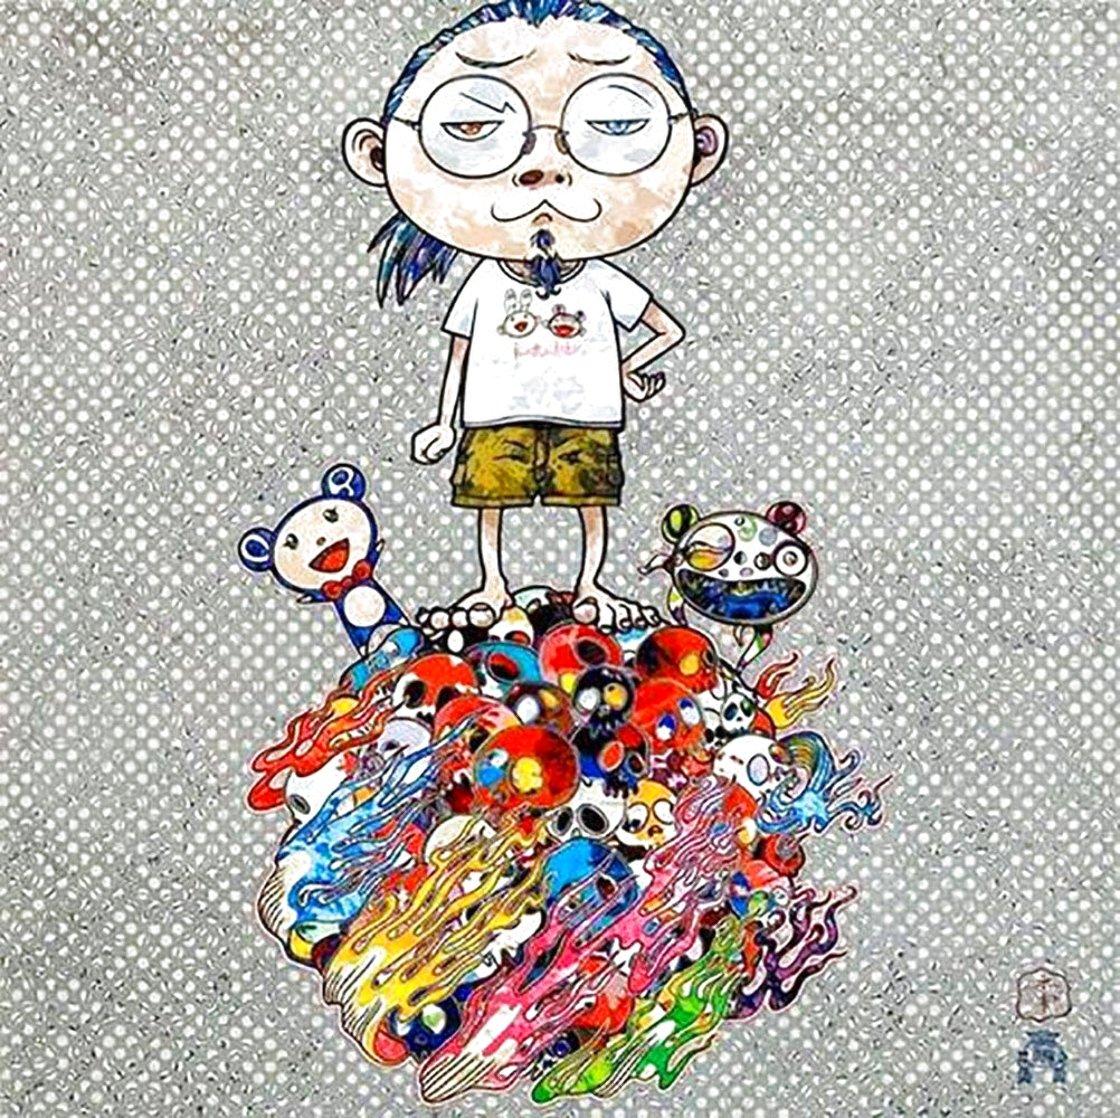 Takashi Murakami 2013 Limited Edition Print by Takashi Murakami